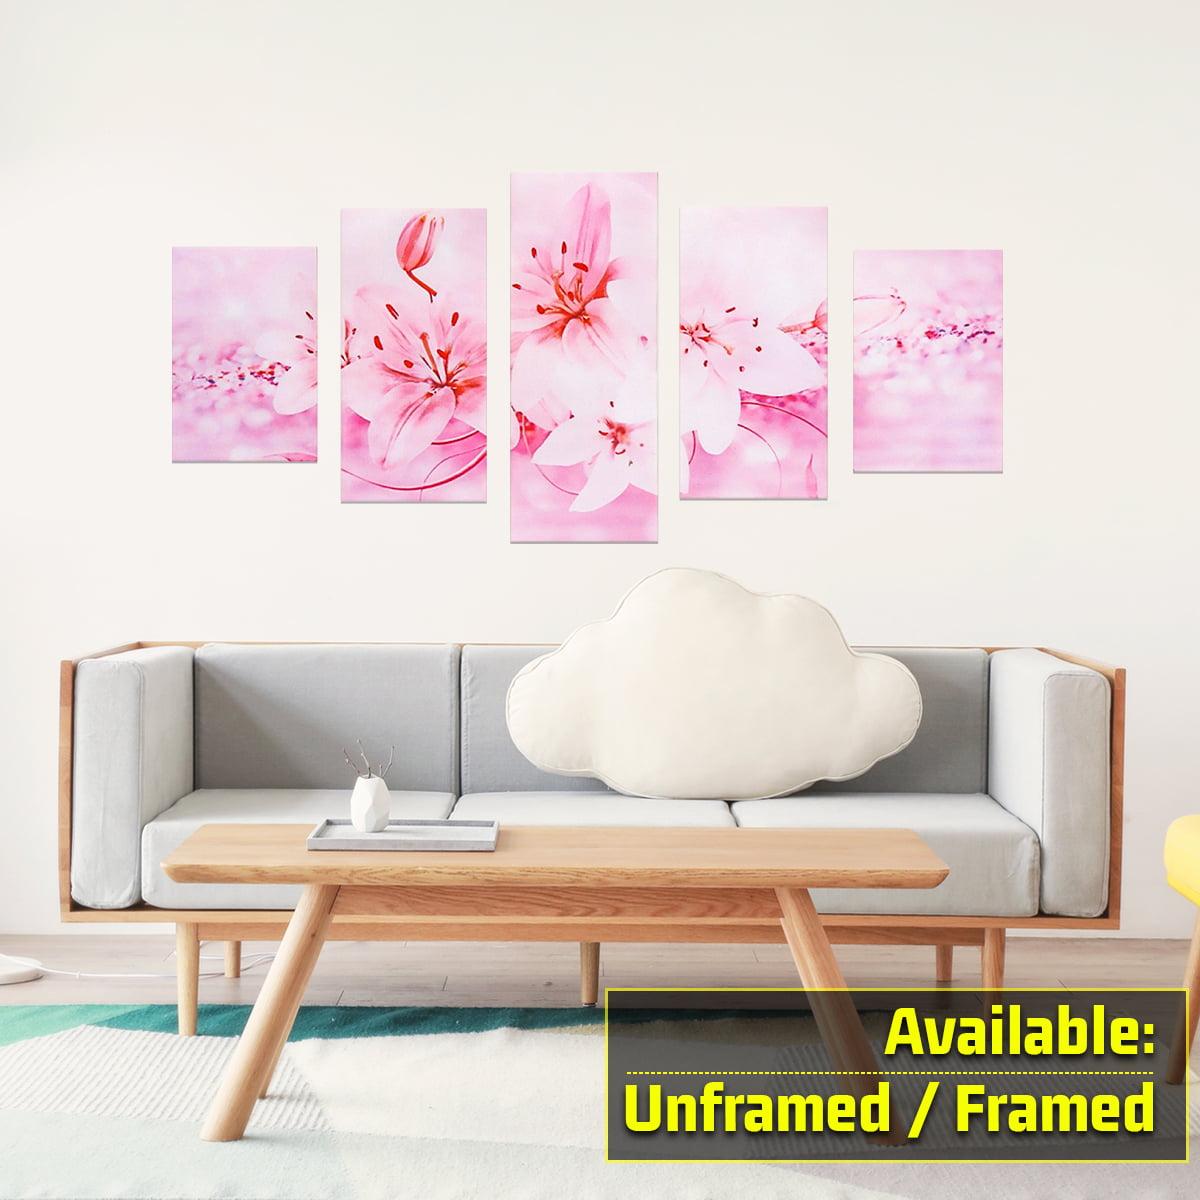 5pcs Modern Abstract Flower Canvas Painting Print Picture Wall Art Decor Living Room Bedroom Home Decoration Framed Unframed Walmart Com Walmart Com